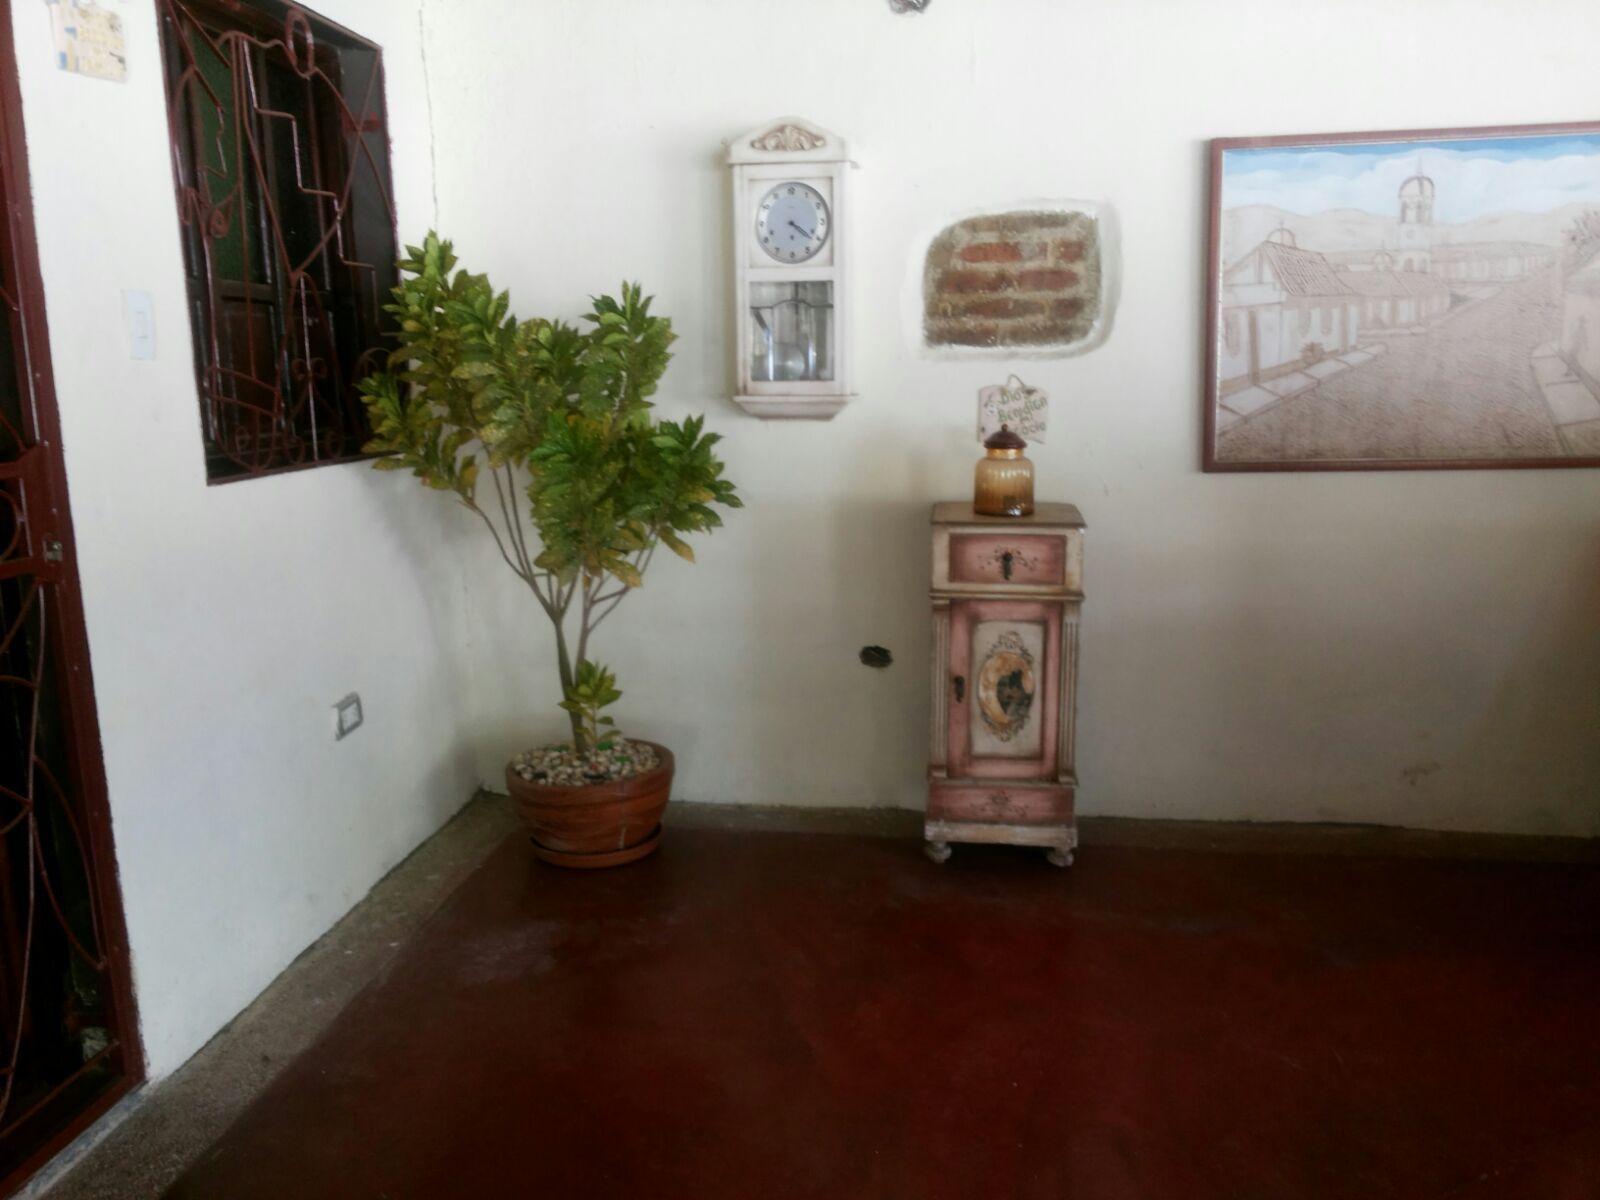 Terreno Carabobo>Municipio San Diego>Mini granjas San Diego - Venta:100.000 US Dollar - codigo: 18-5054